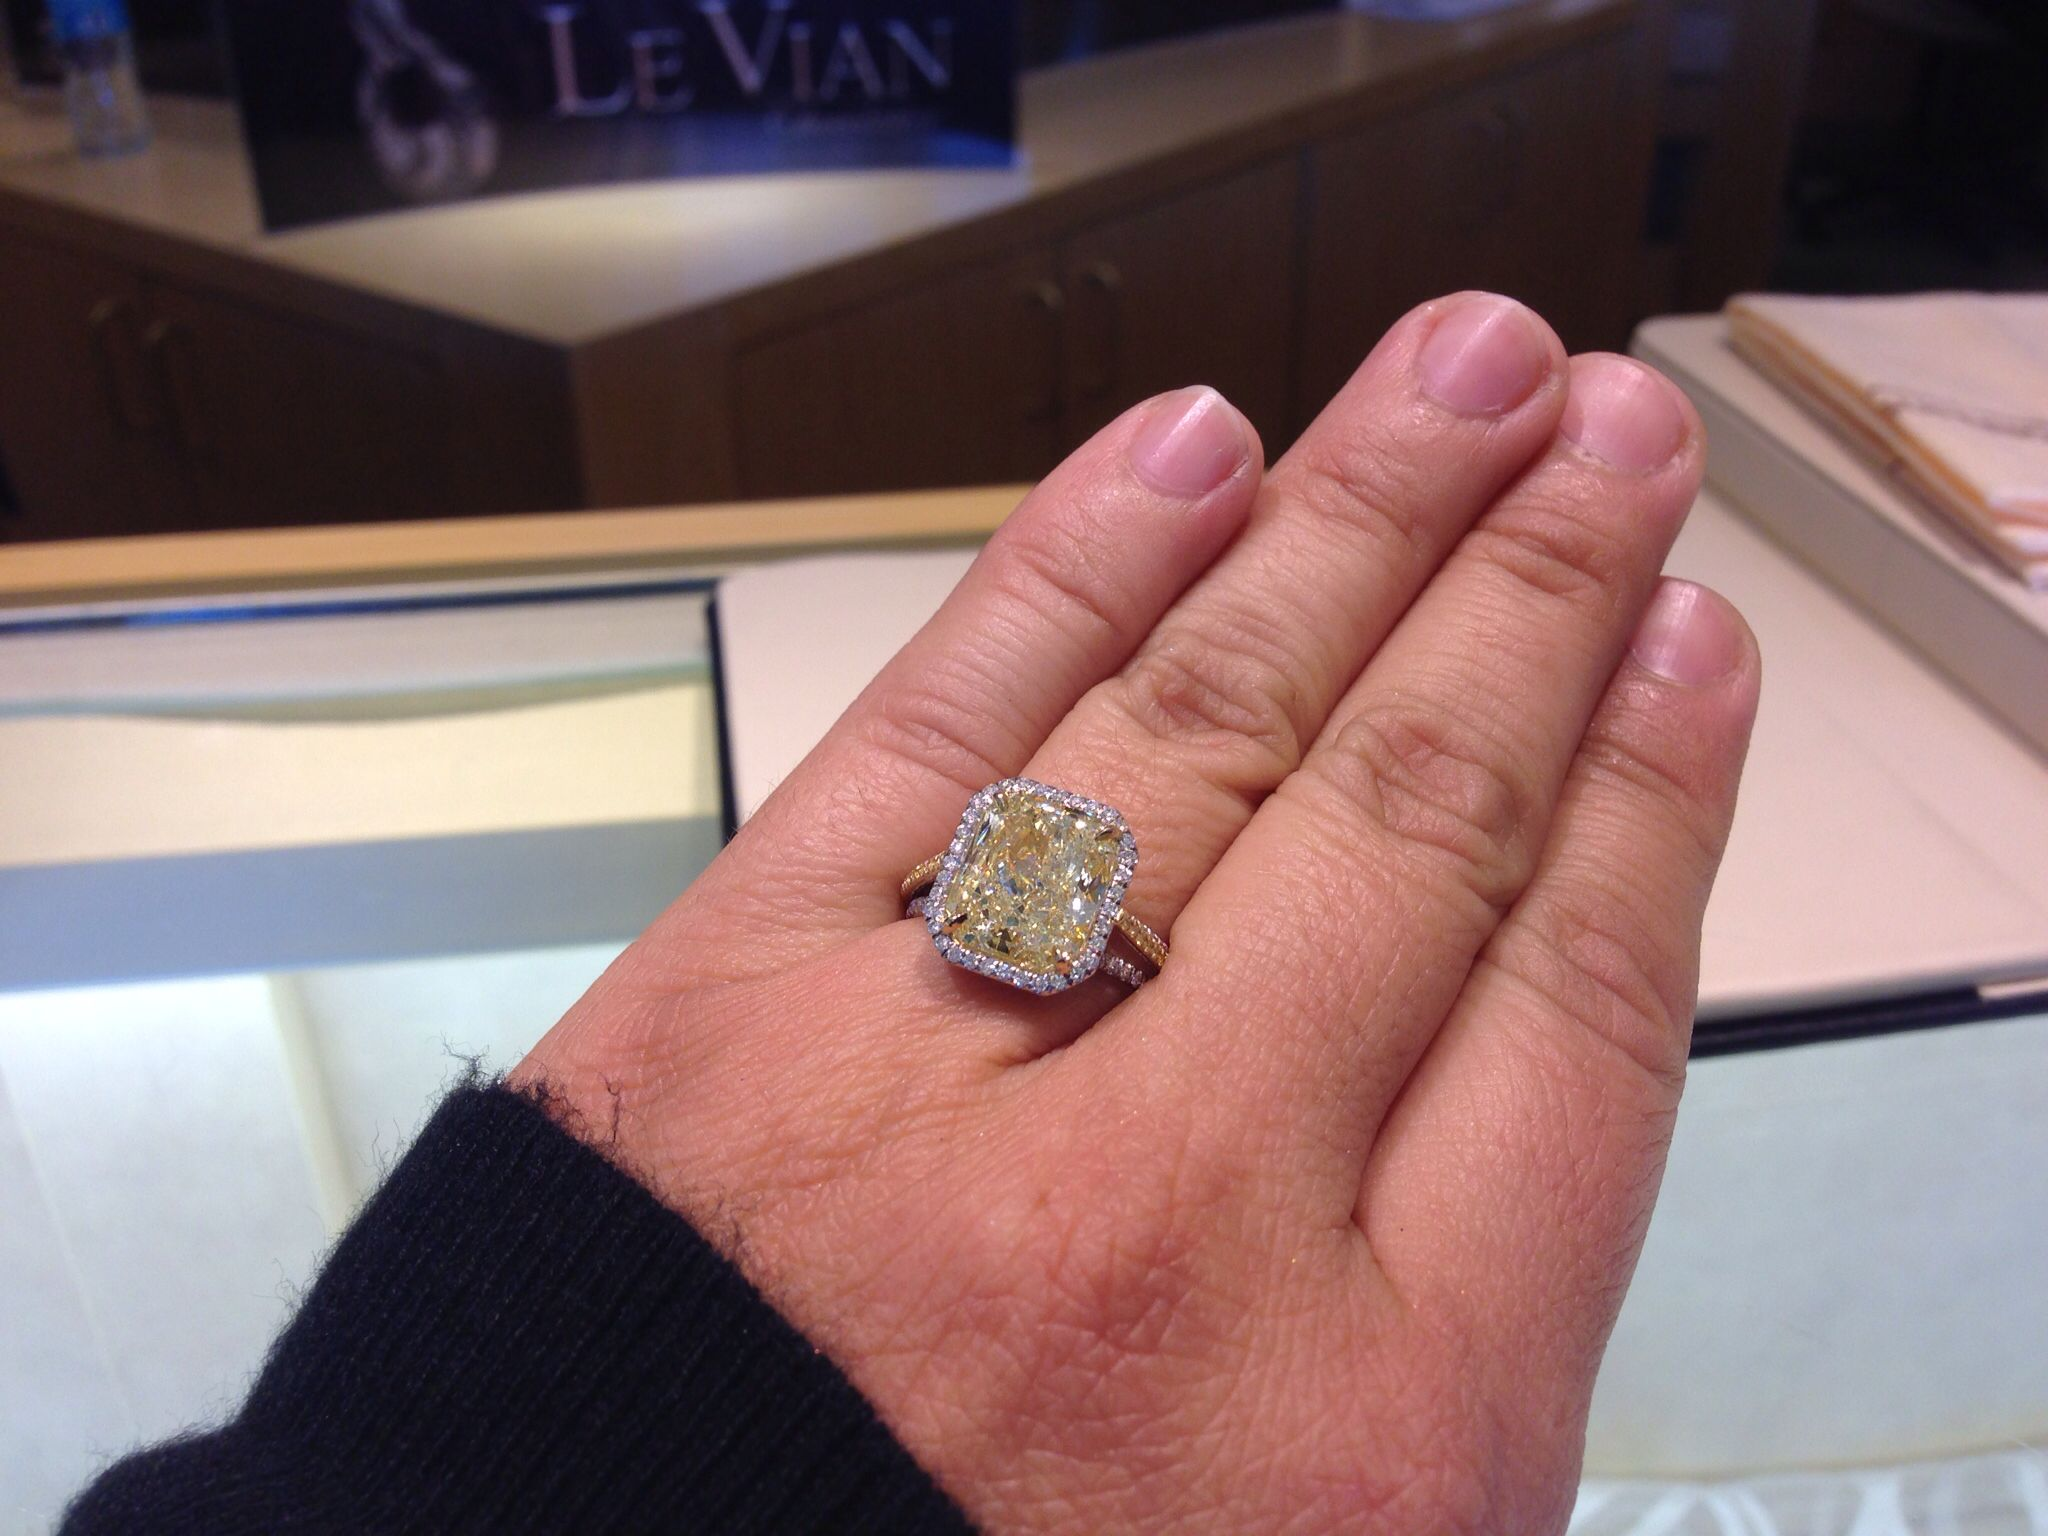 Le vian yellow diamonds.....oh my! | One day...ICE | Pinterest | Le vian